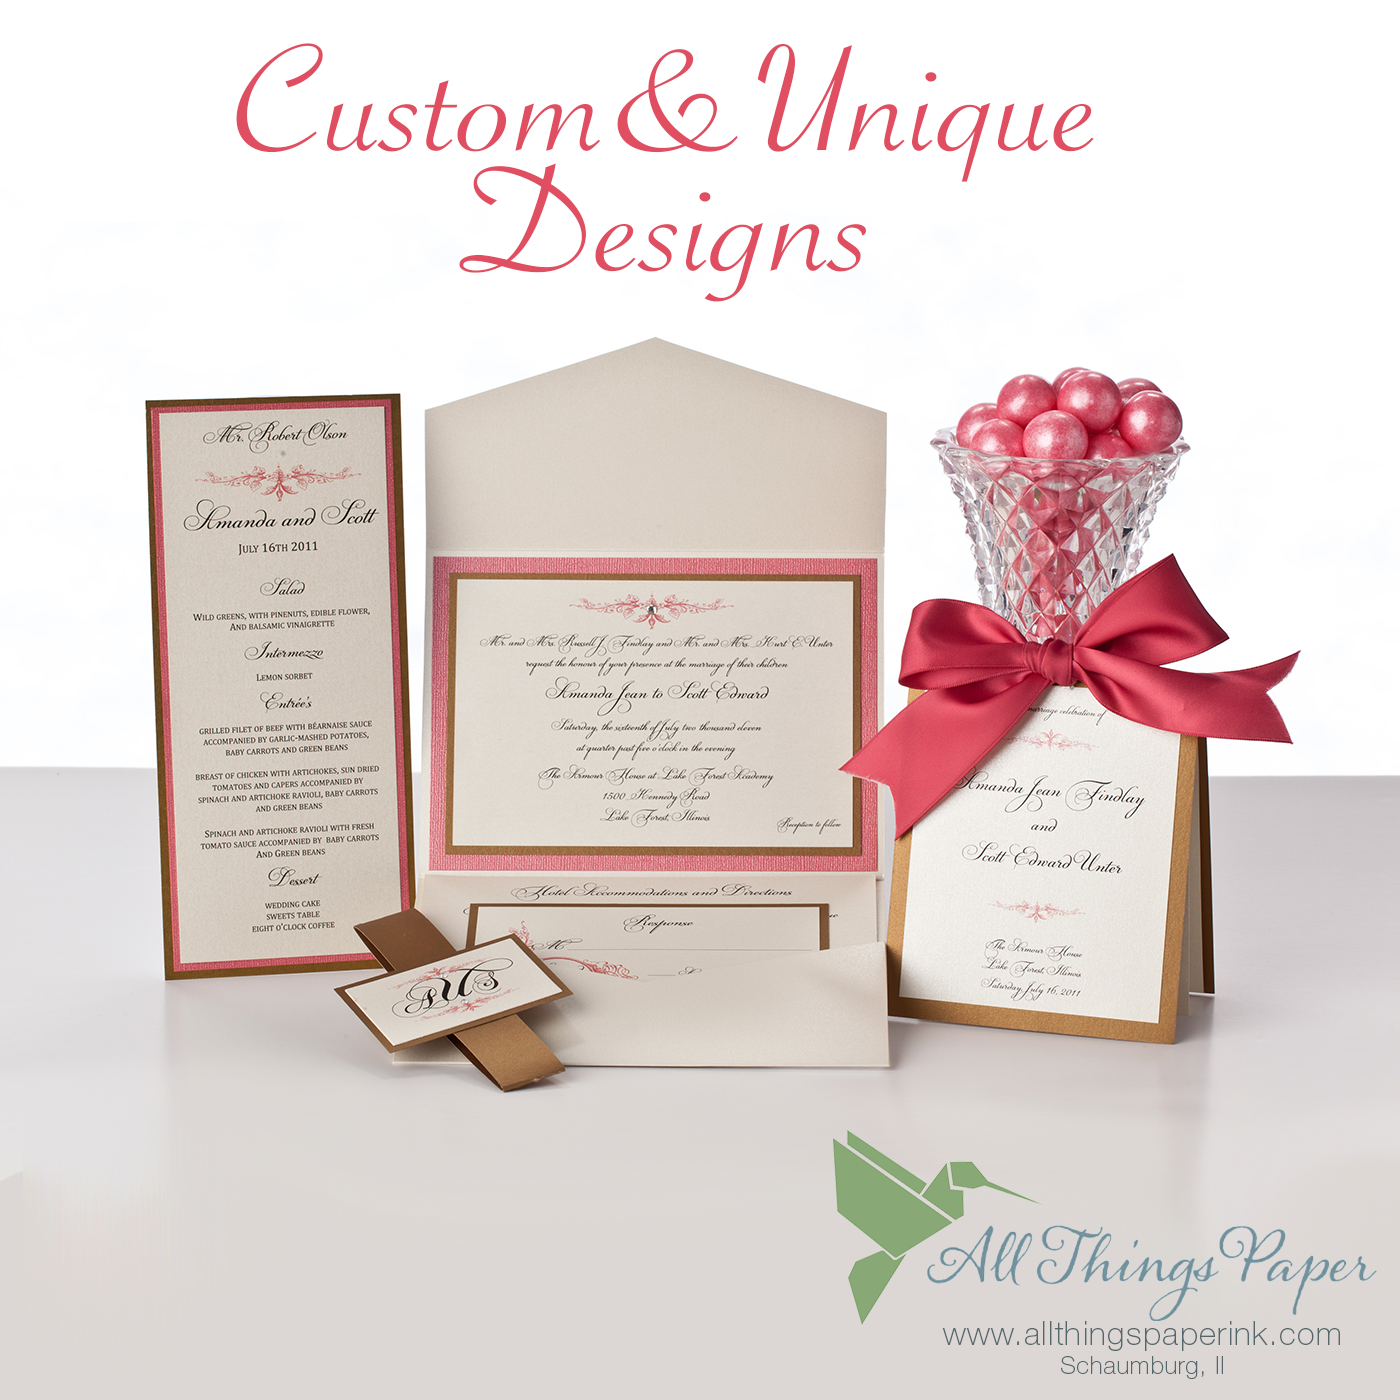 Choose from hundreds of wedding invitation design options or we will choose from hundreds of wedding invitation design options or we will create something truly custom and stopboris Choice Image